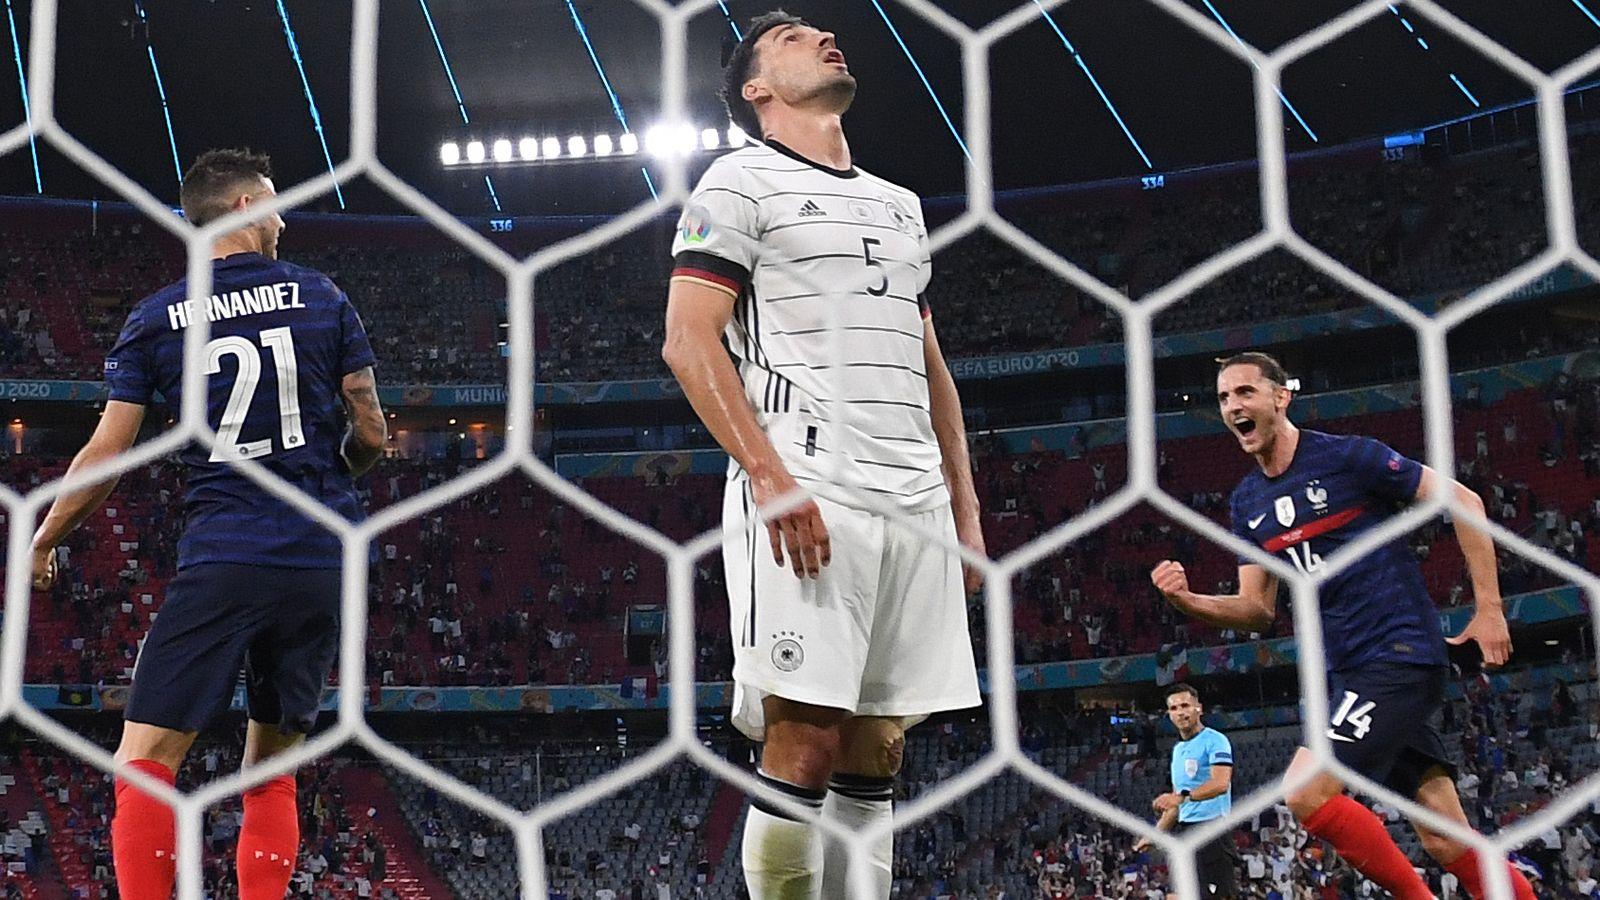 France 1-0 Germany: Mats Hummels' own goal gives world champions winning start at Euro 2020